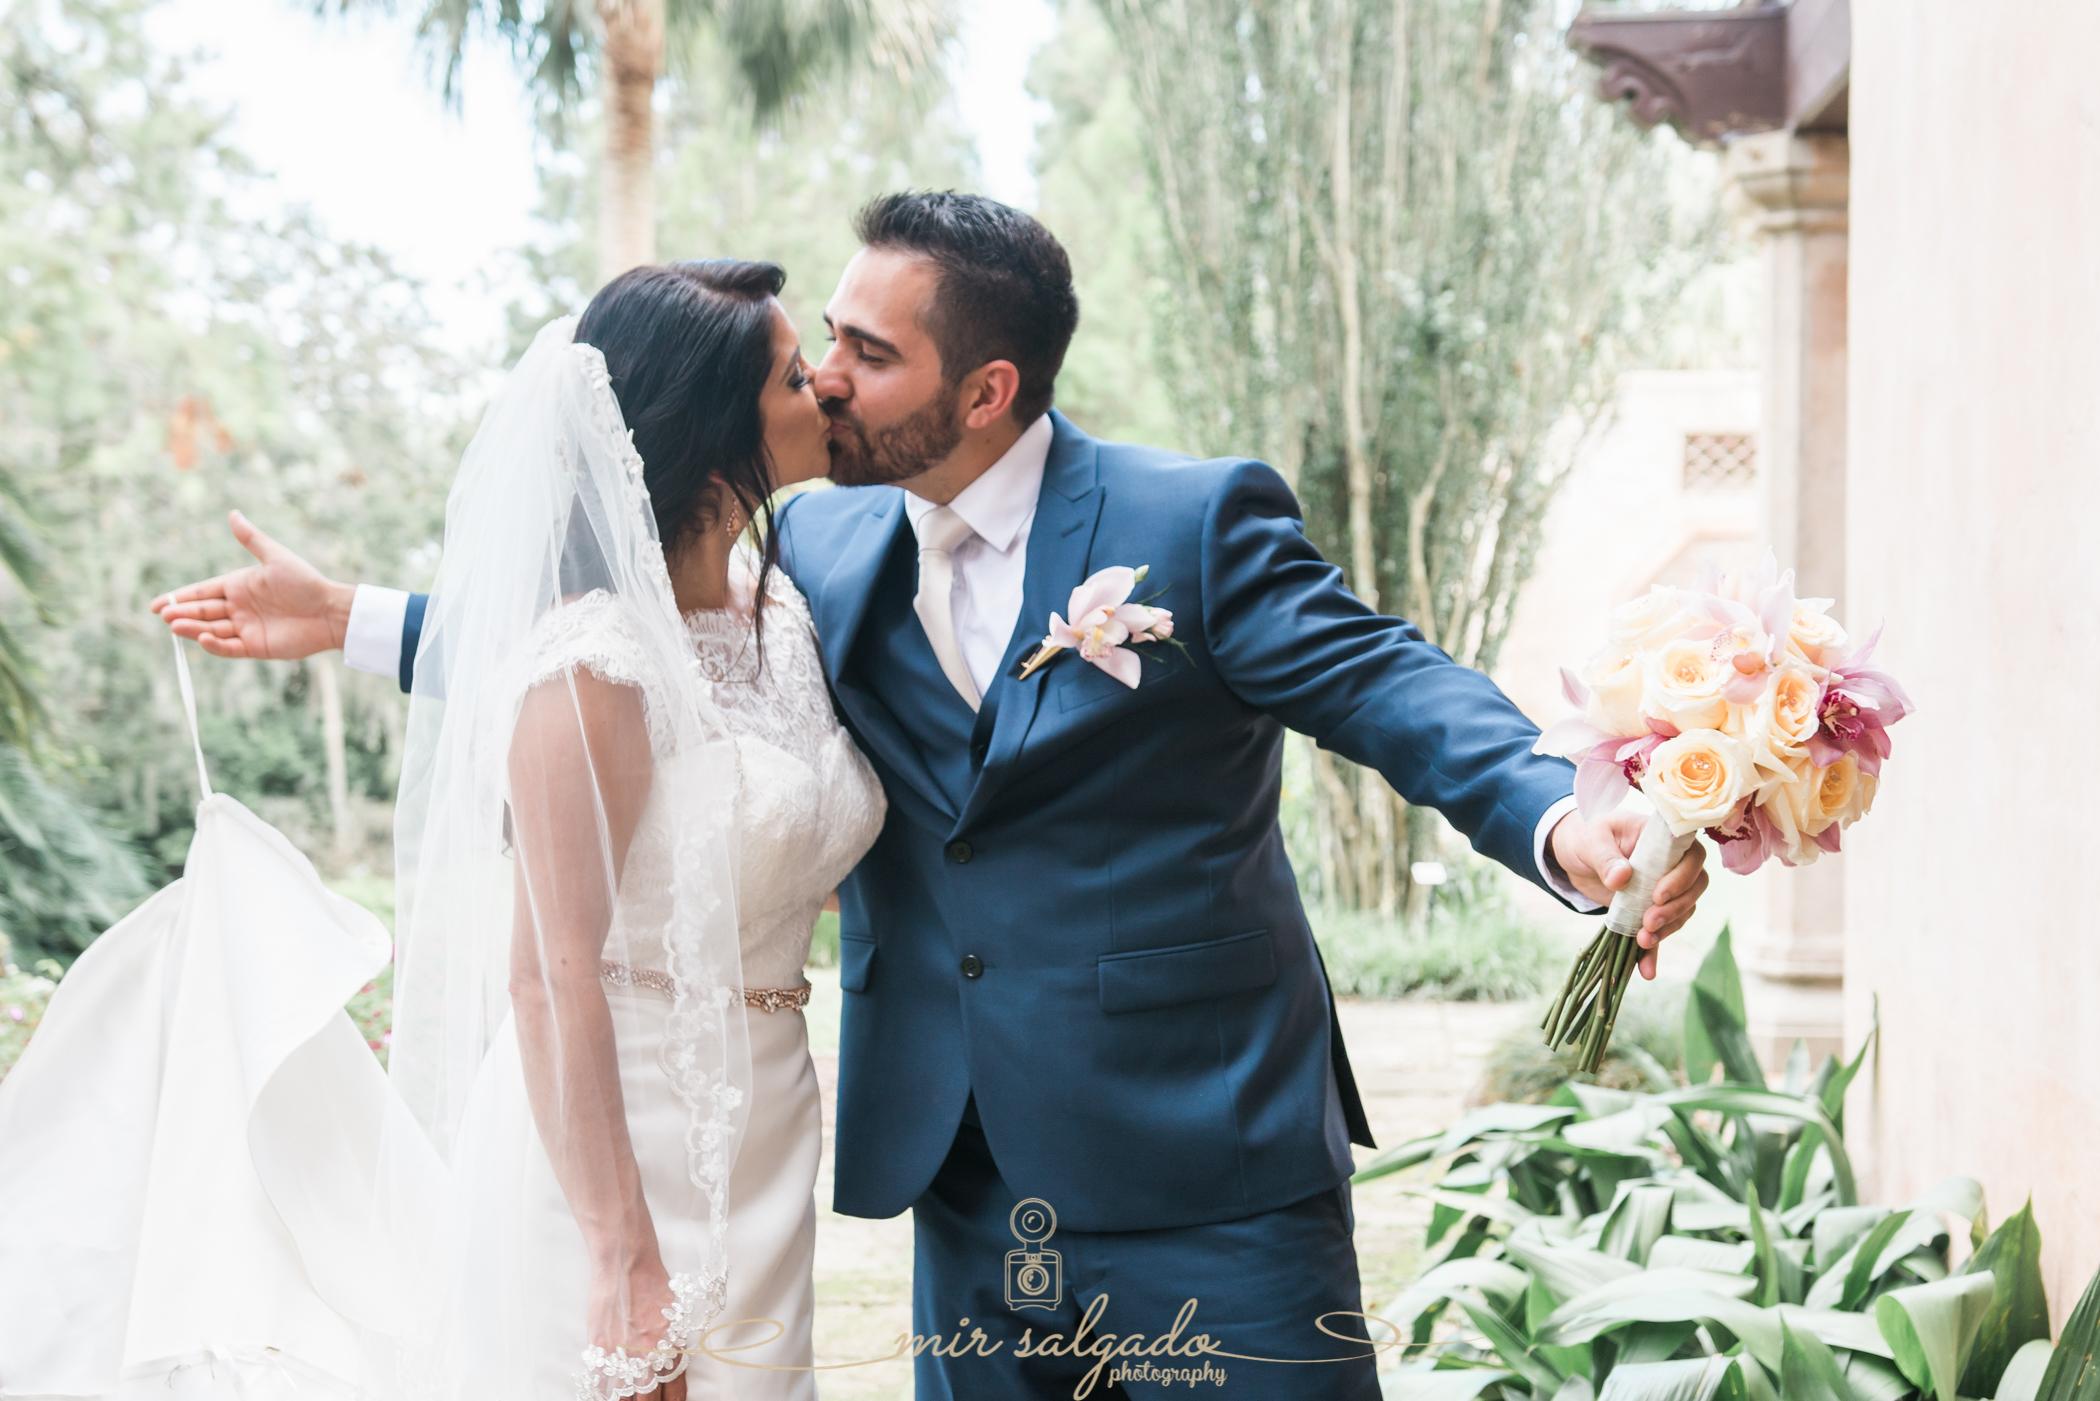 Bok-tower-gardens-wedding-photo, bride-and-groom-photo, Tampa-wedding